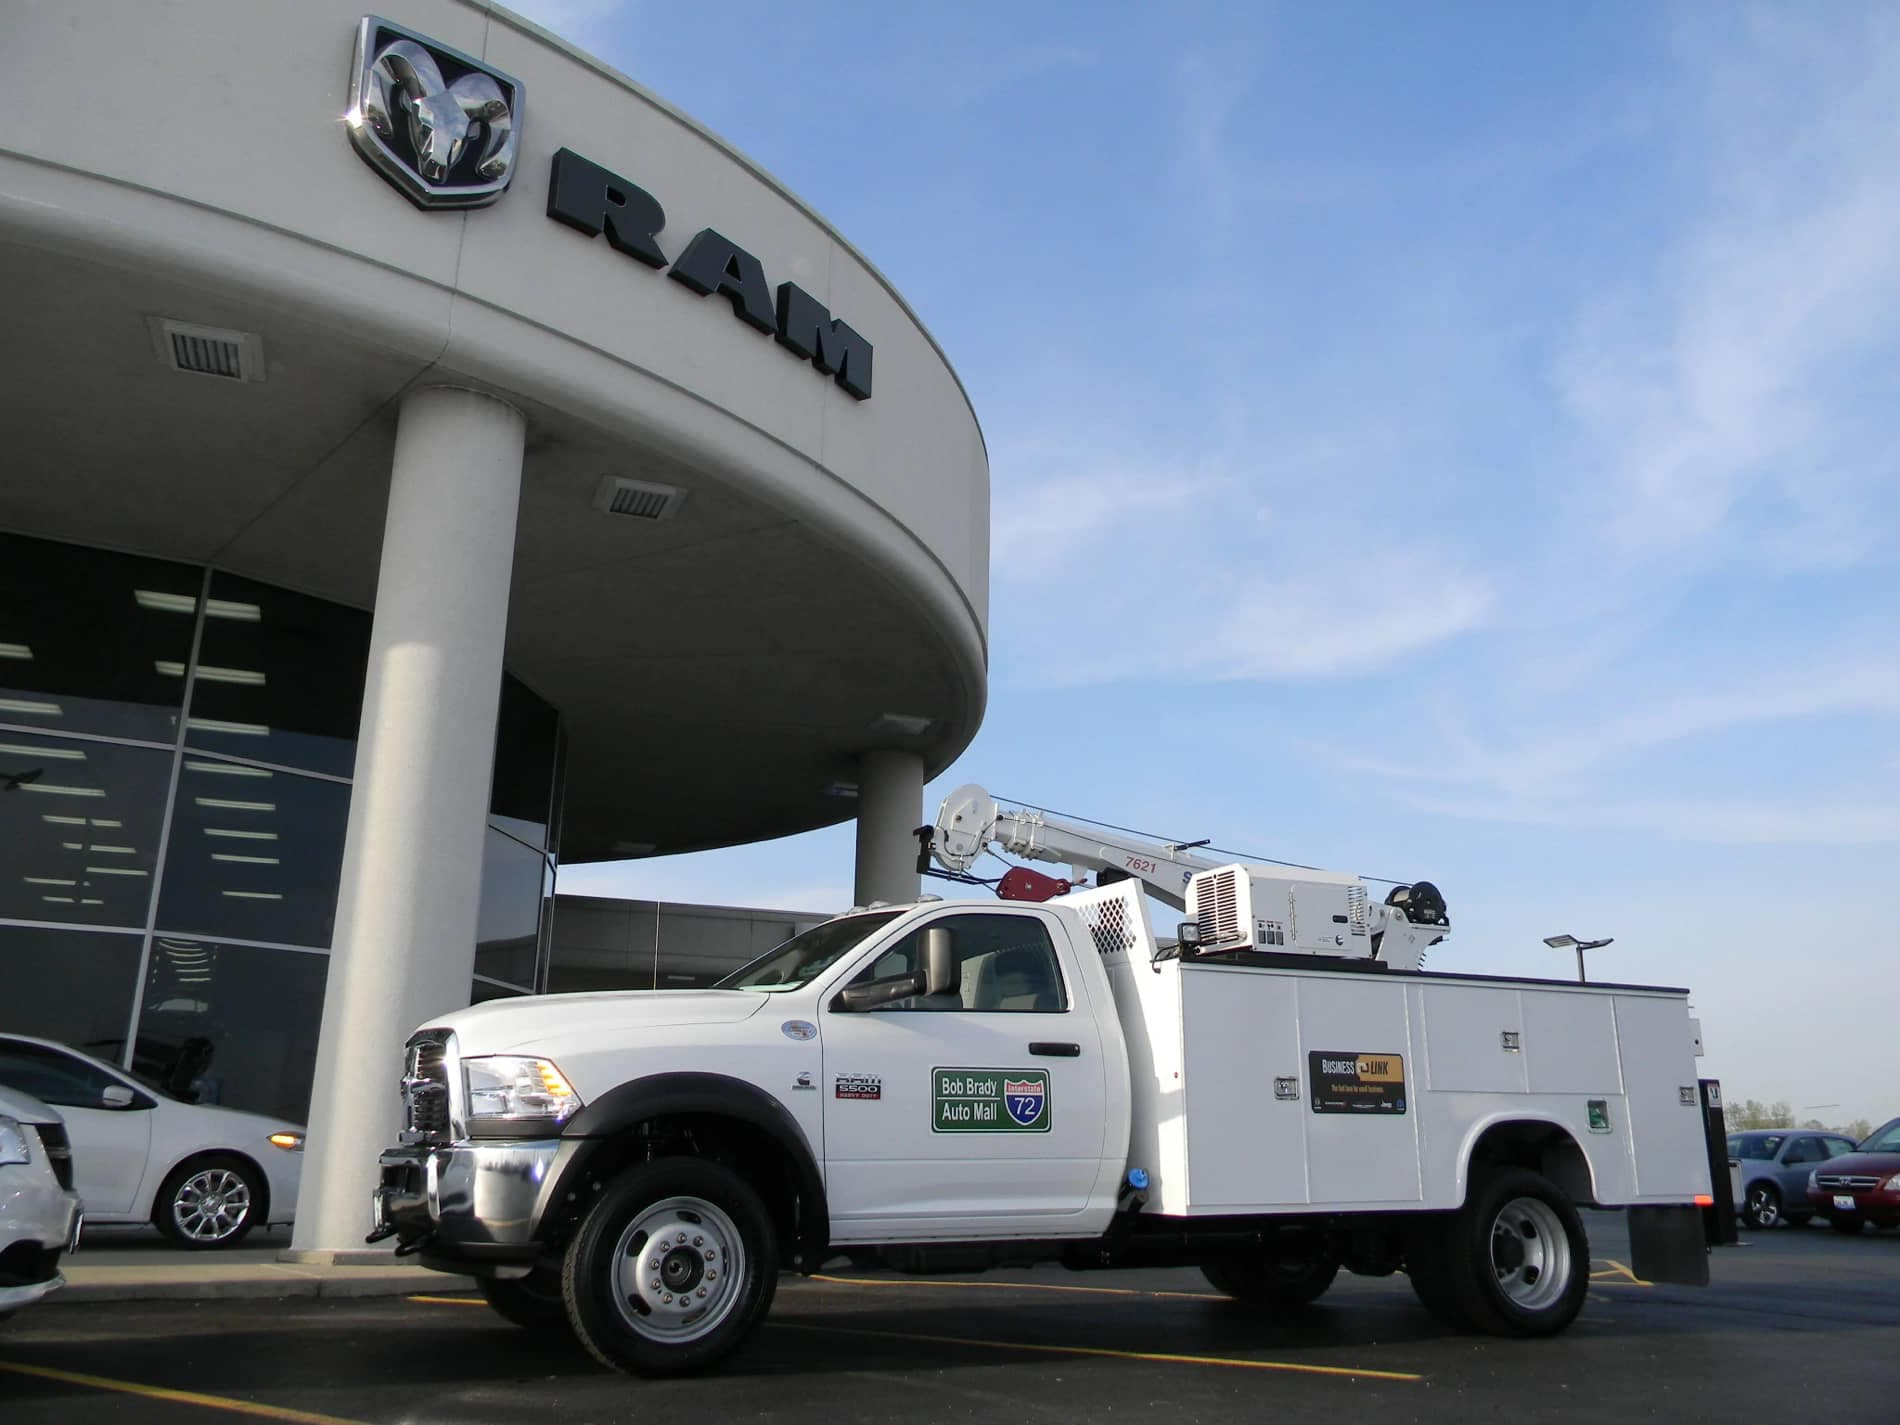 Bob Brady Truck with Upfit and Crane